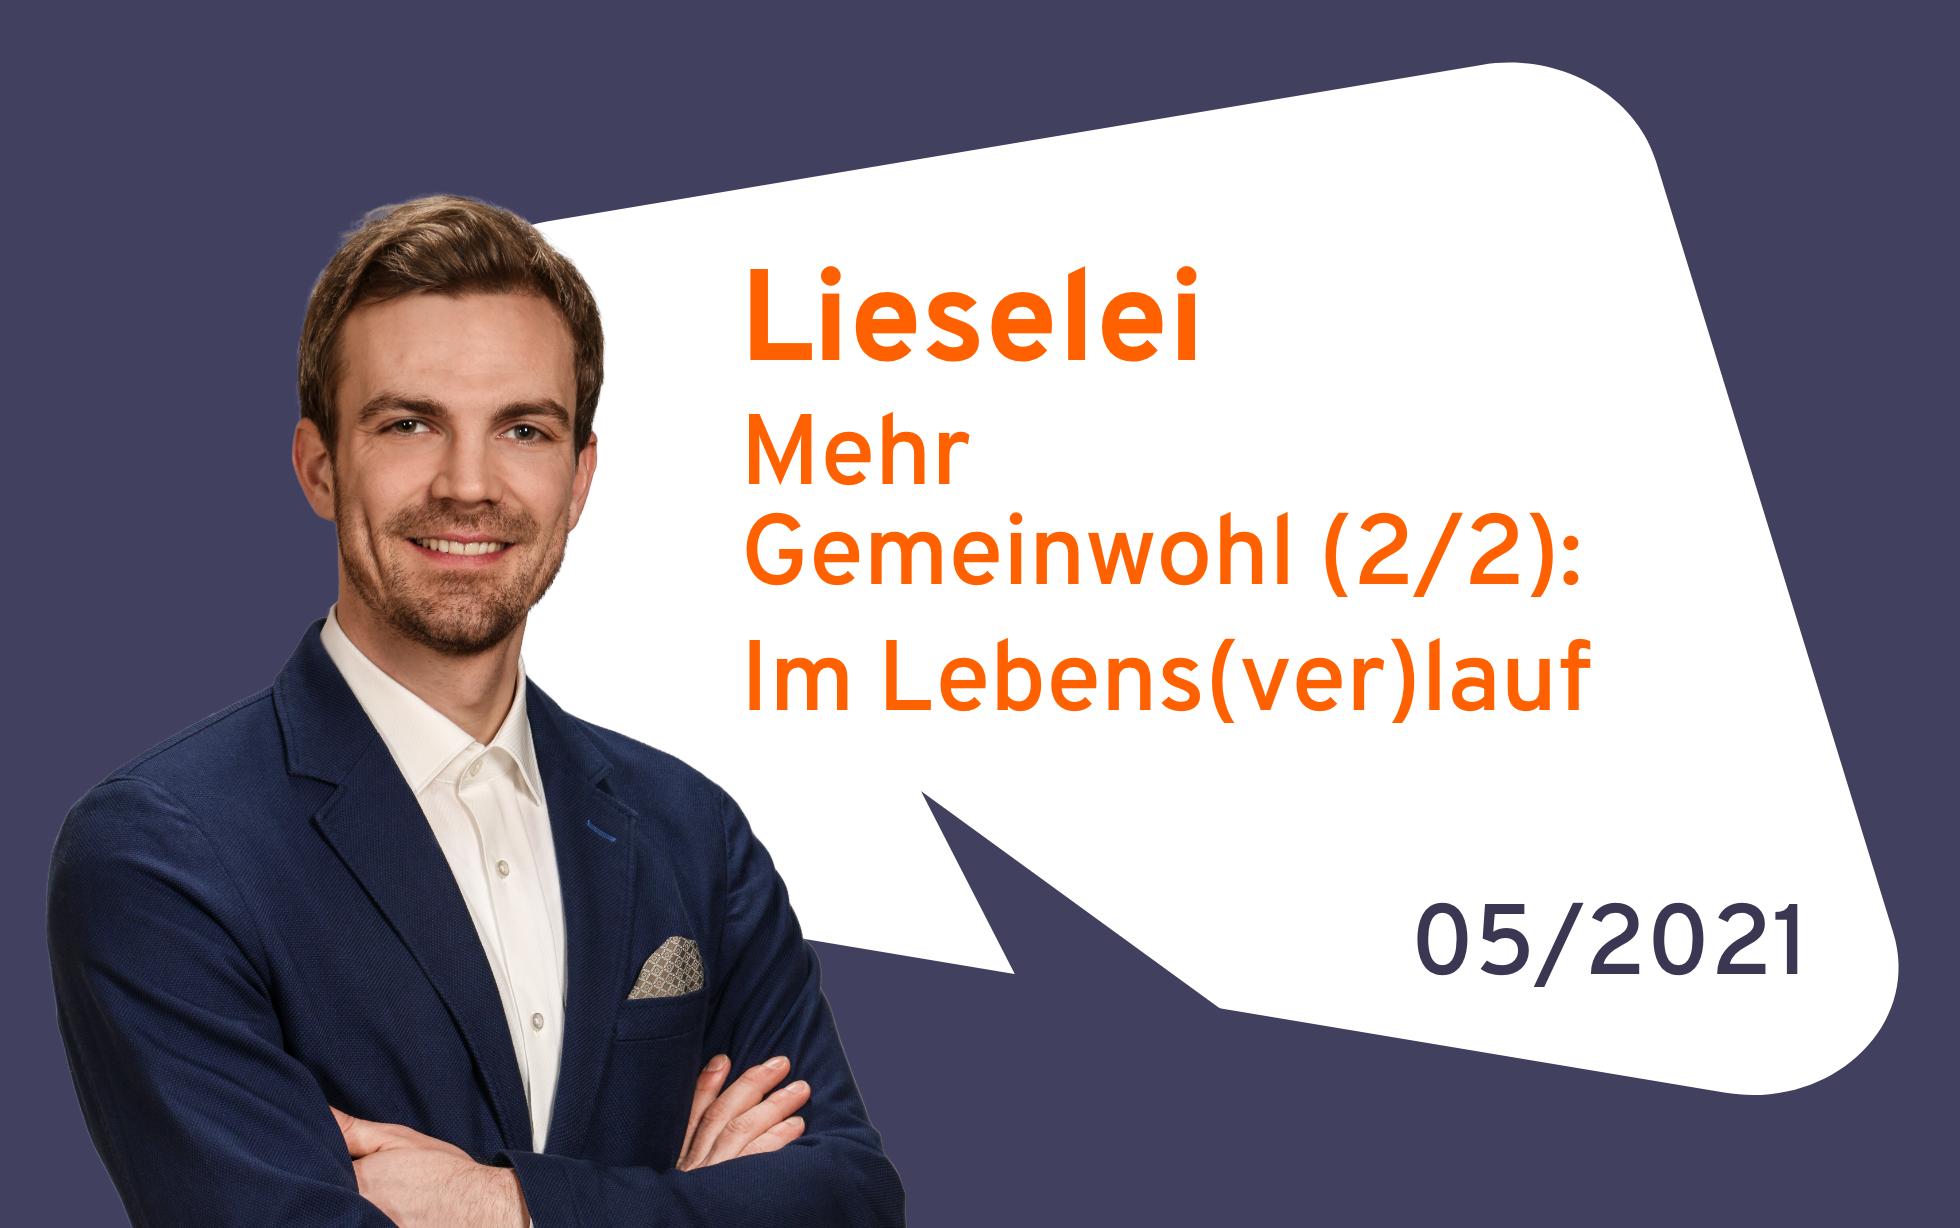 Lieselei: Mehr Gemeinwohl (2/2)